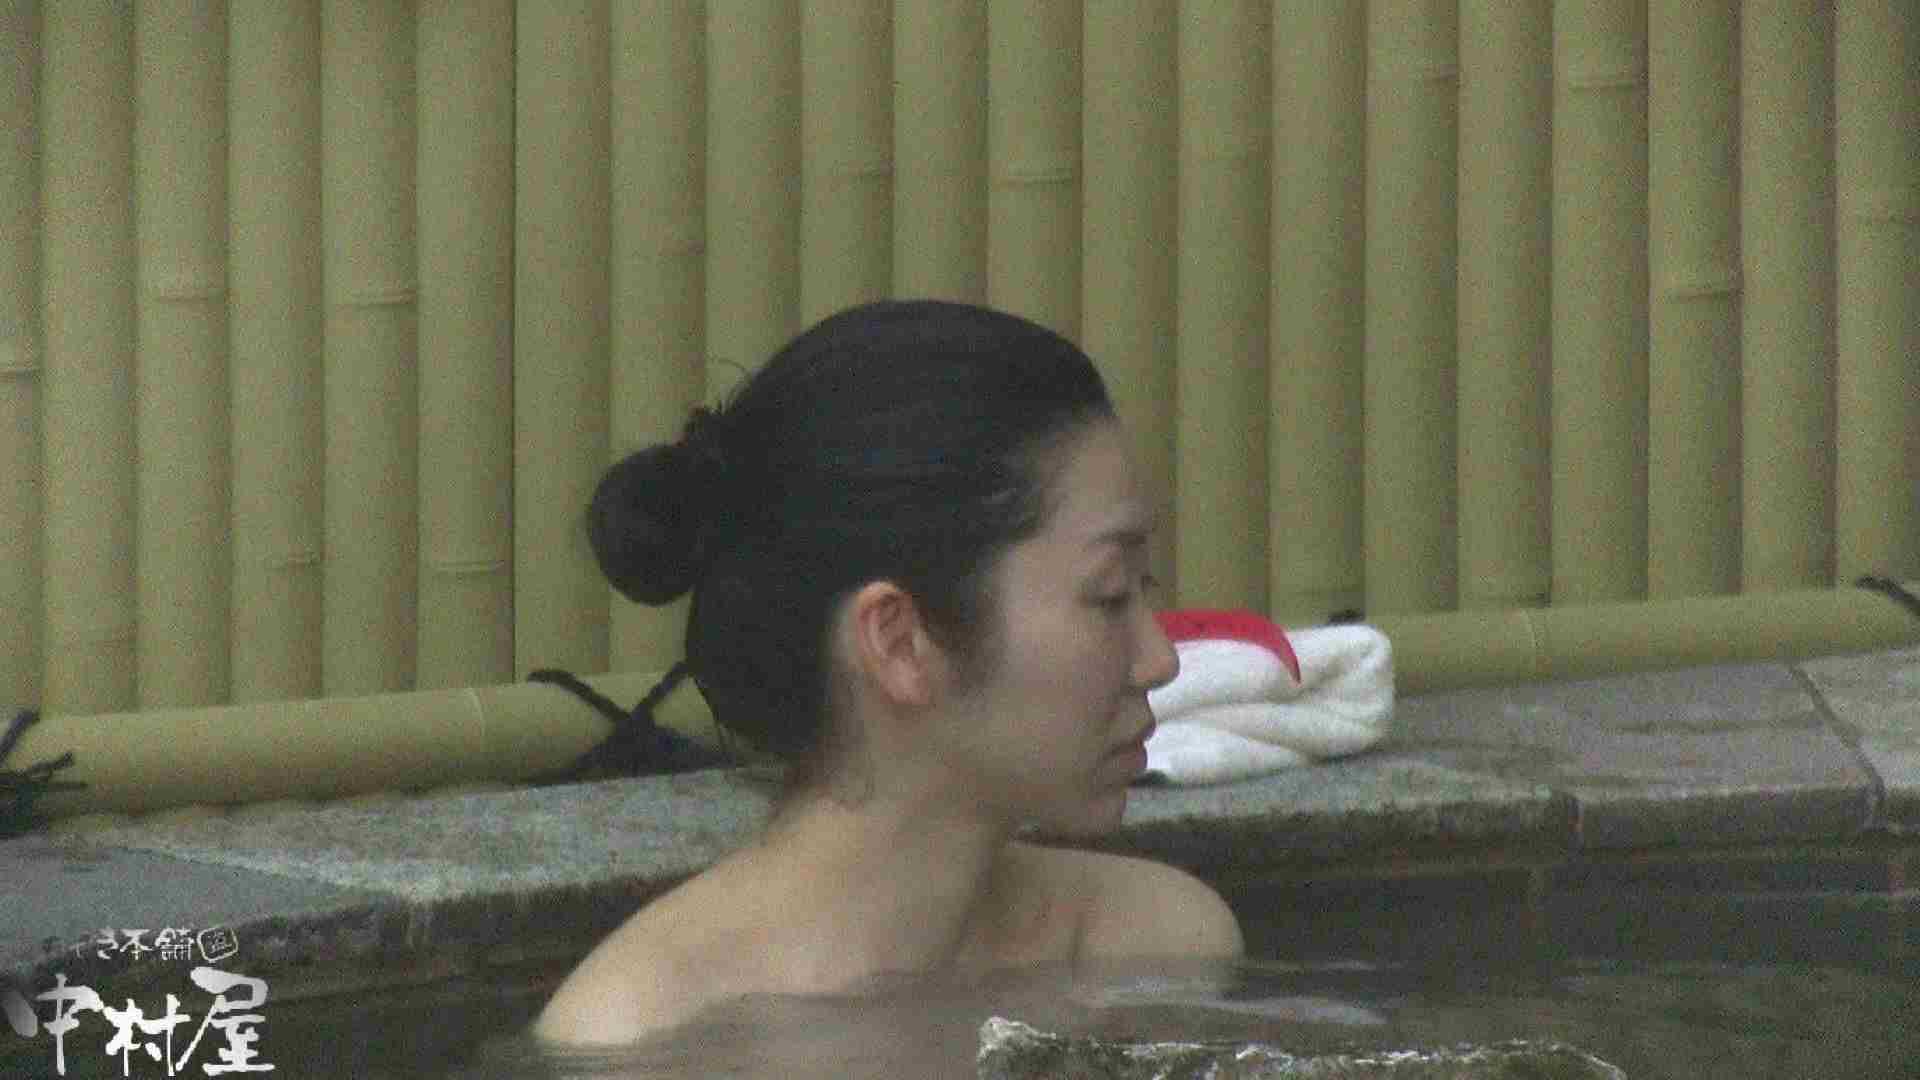 Aquaな露天風呂Vol.917 露天 セックス無修正動画無料 102画像 71